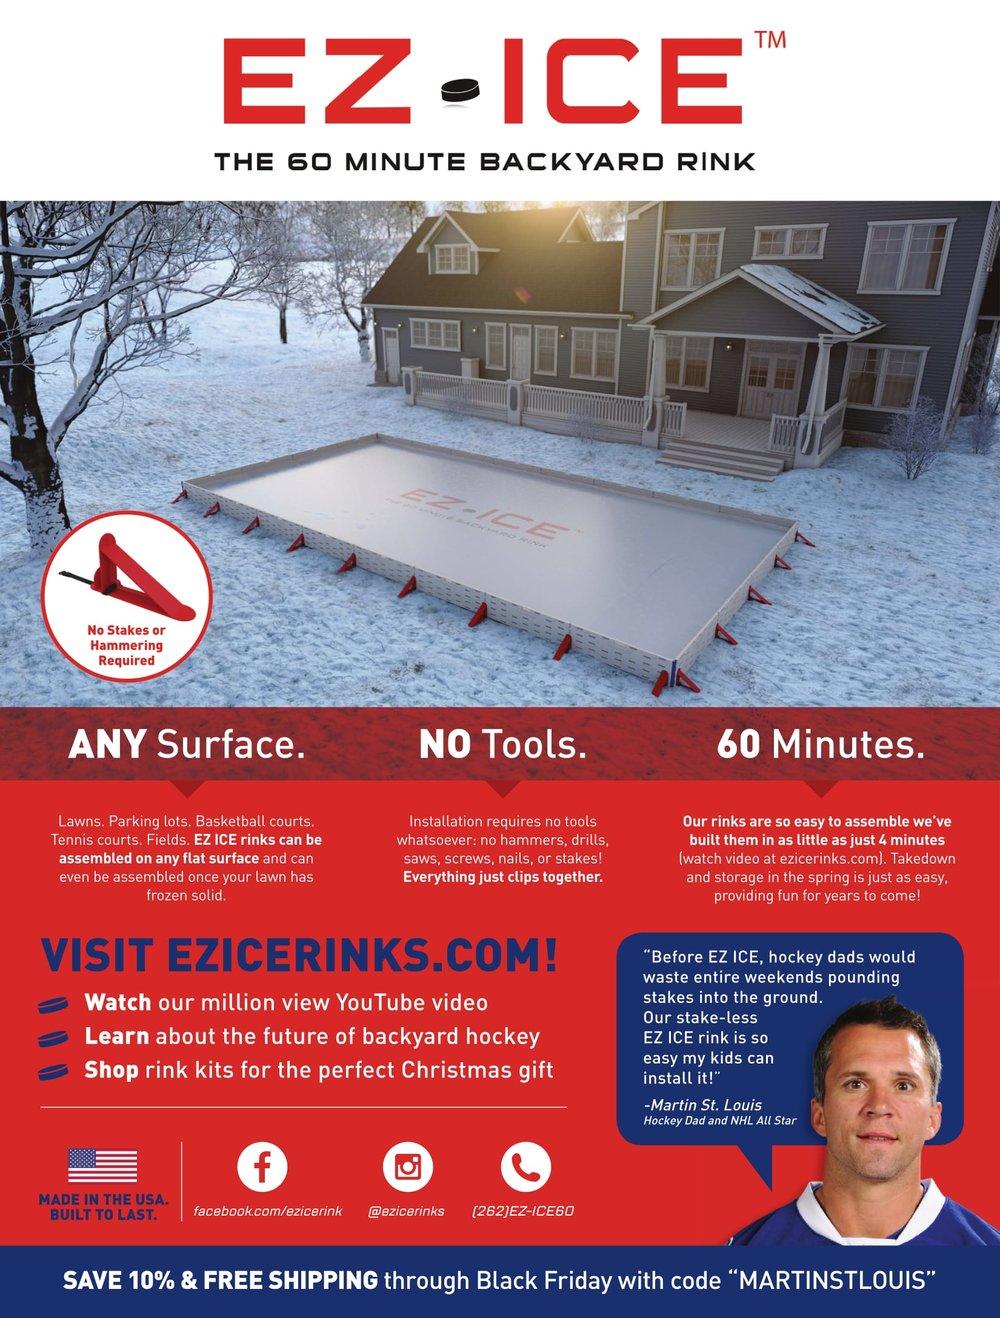 EZ ICE Flyer (Marty St. Louis Code)